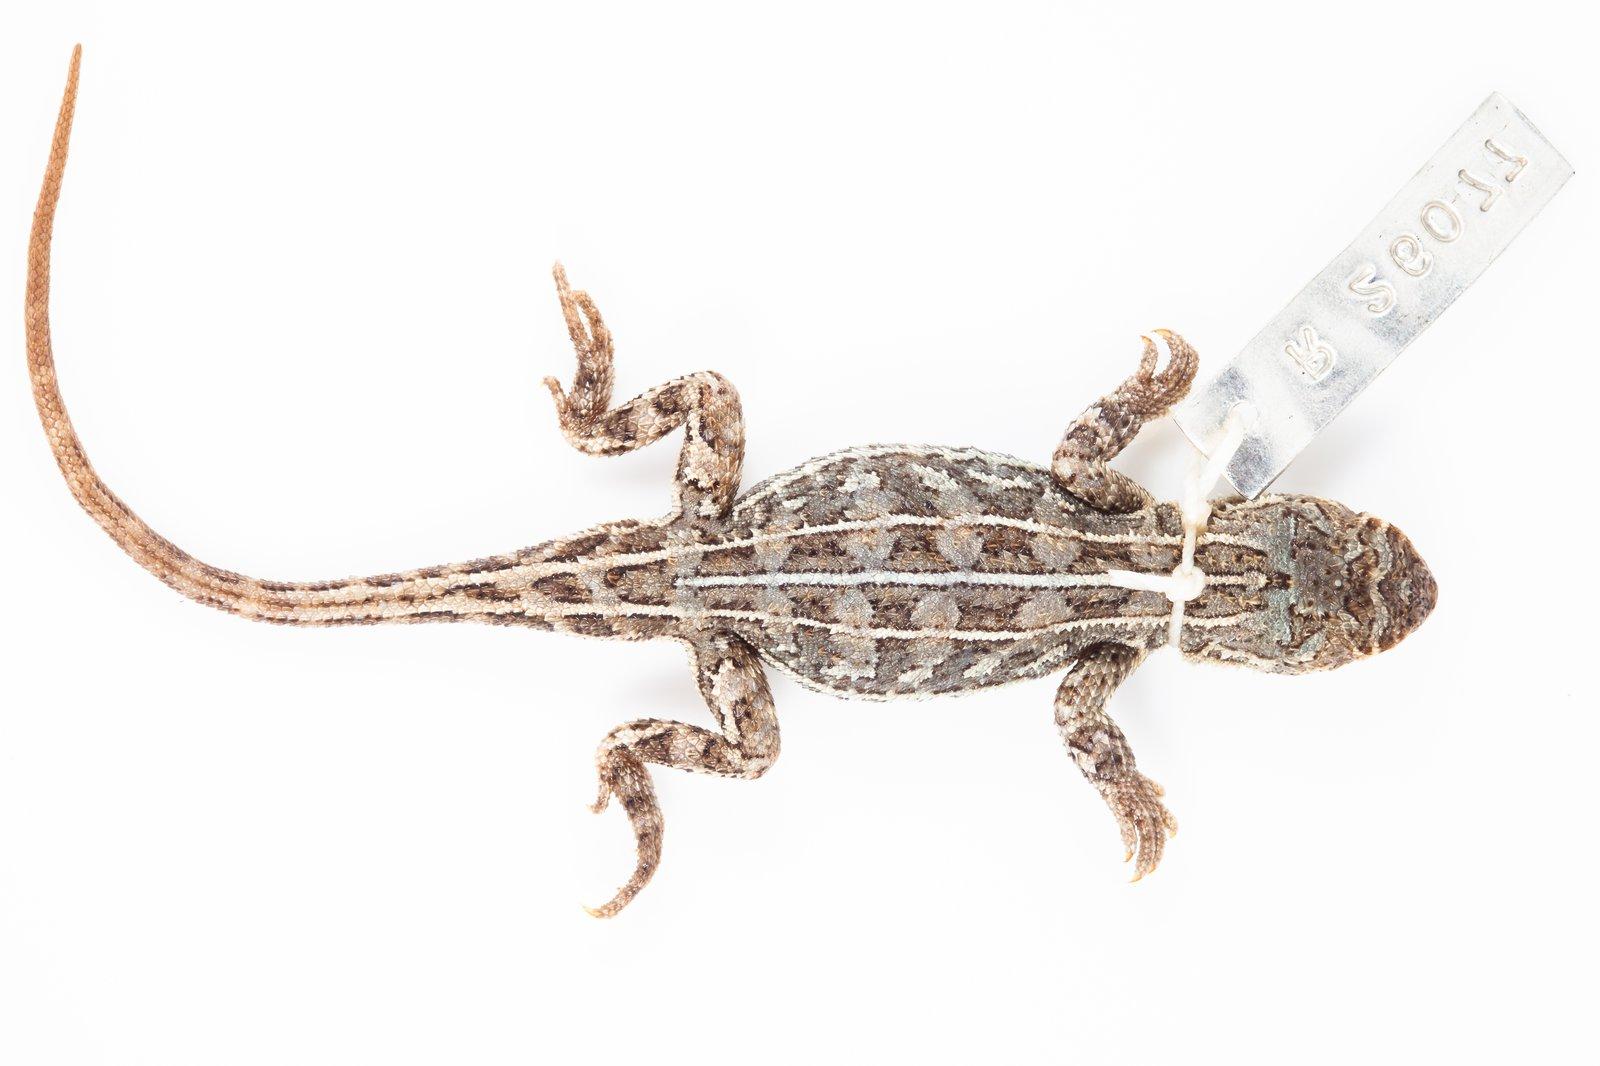 Bathurst Earless Dragon (Tympanocryptis mccartneyi)